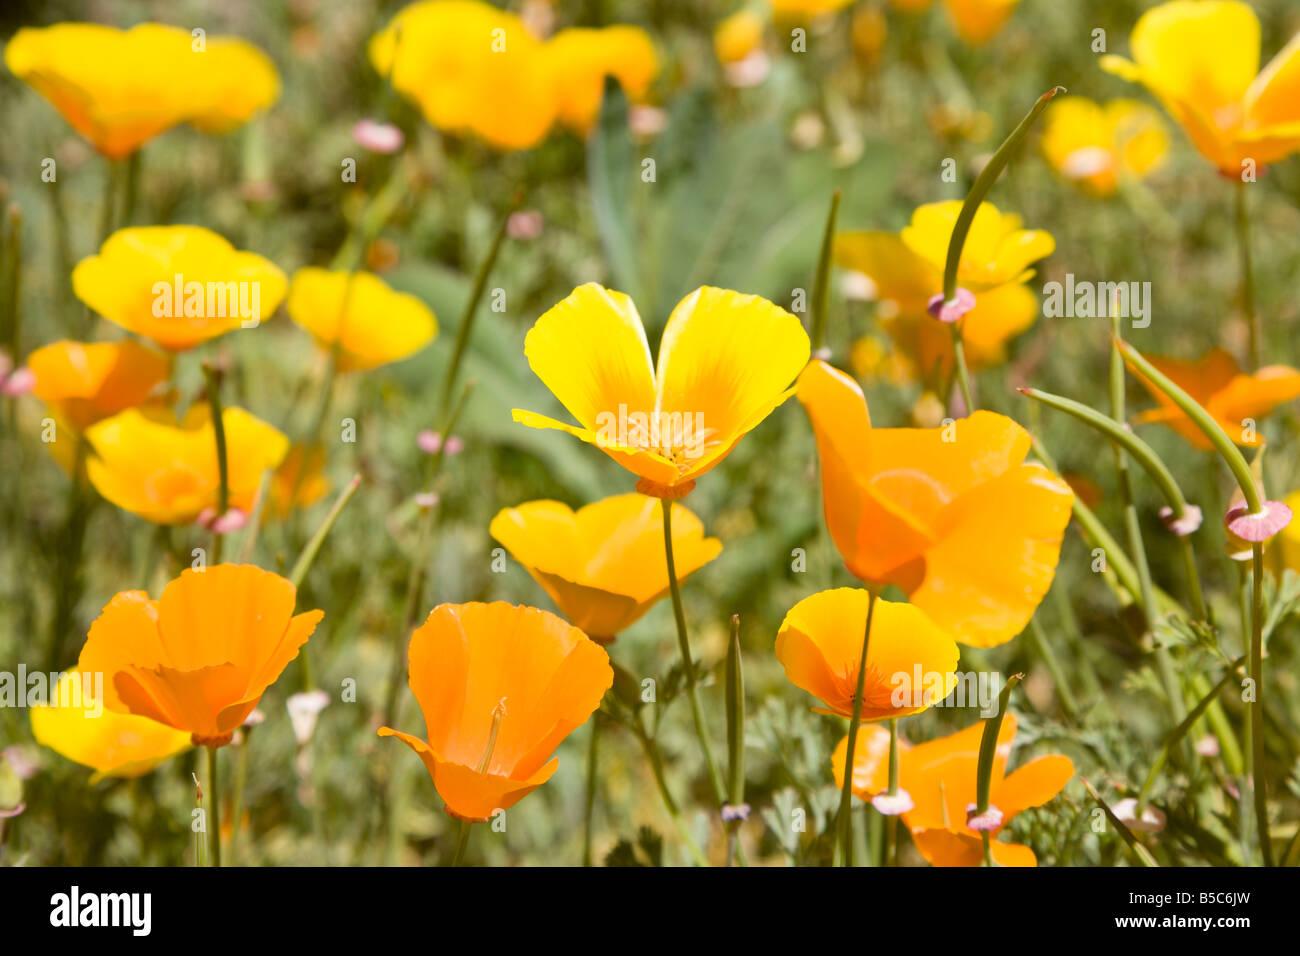 Yellow Poppies Stock Photos Yellow Poppies Stock Images Alamy